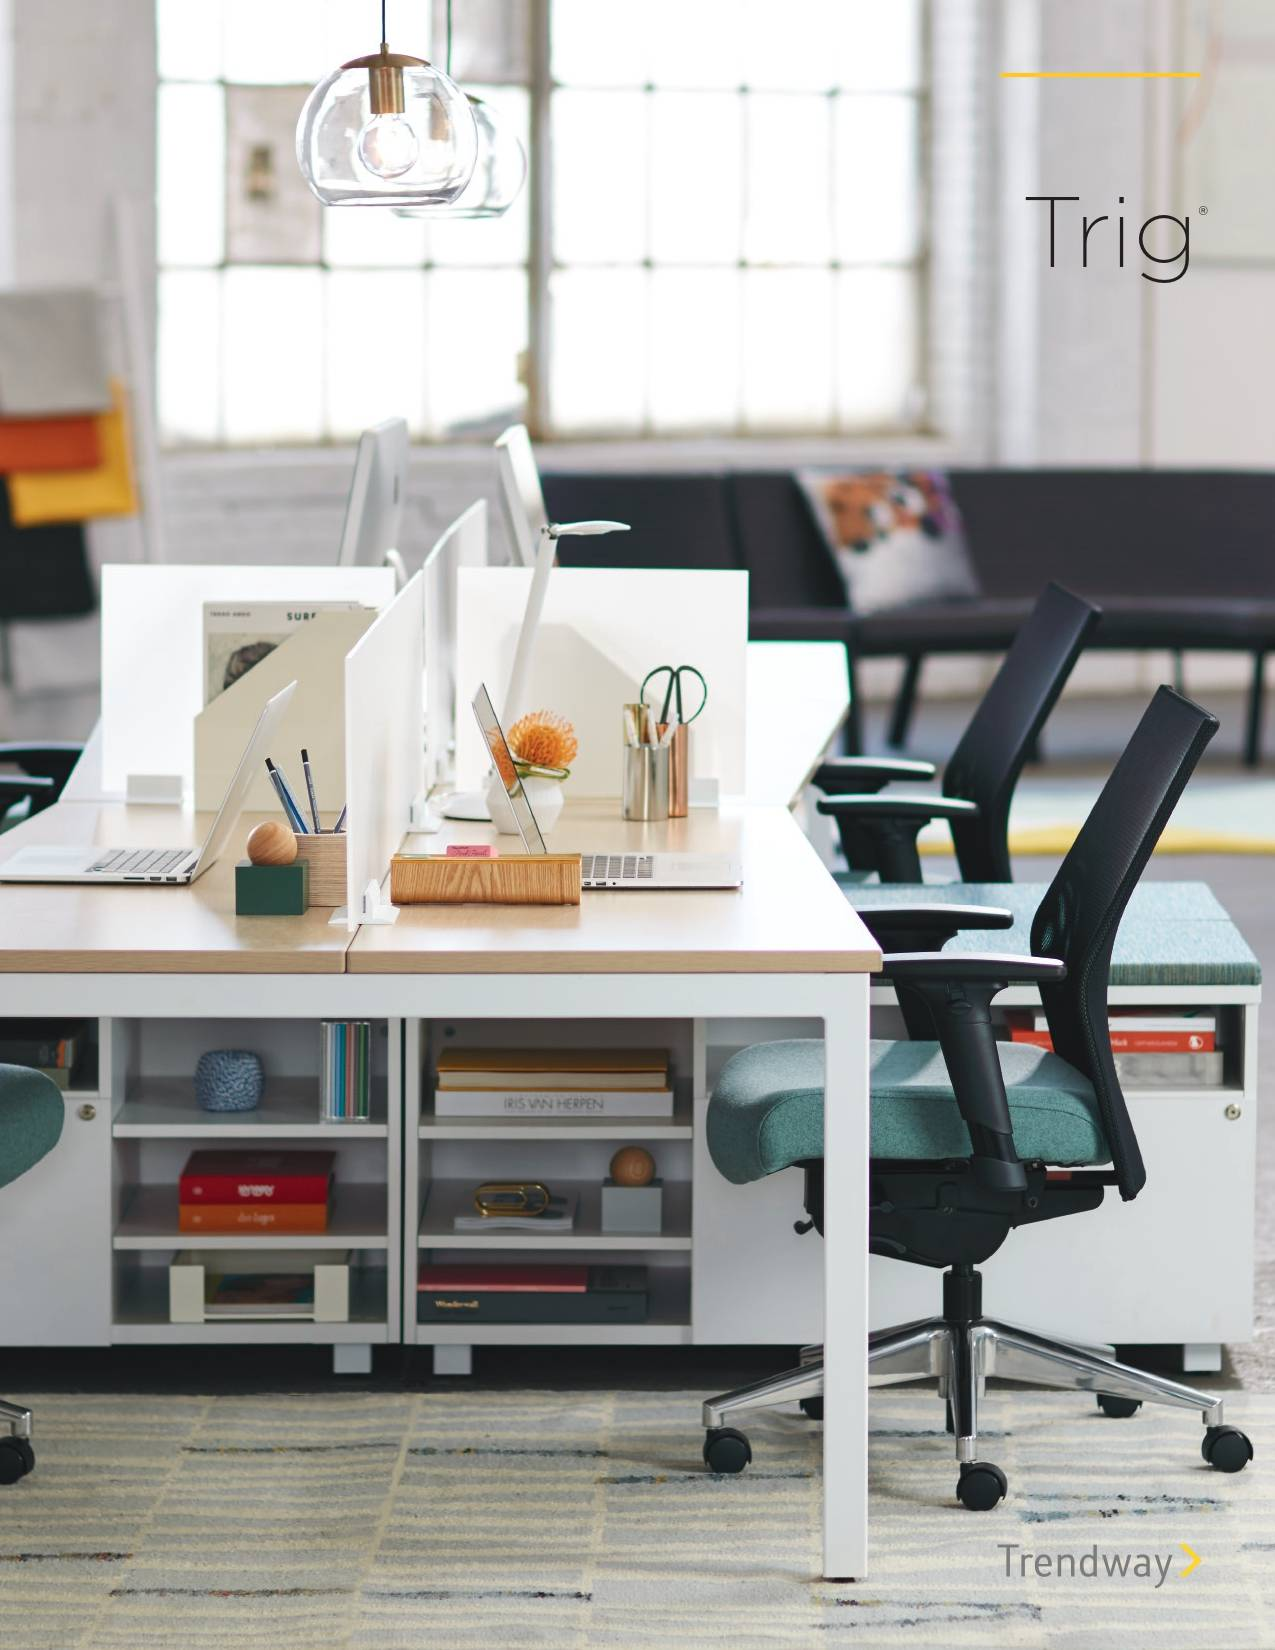 Trendway Furniture Trig Brochure